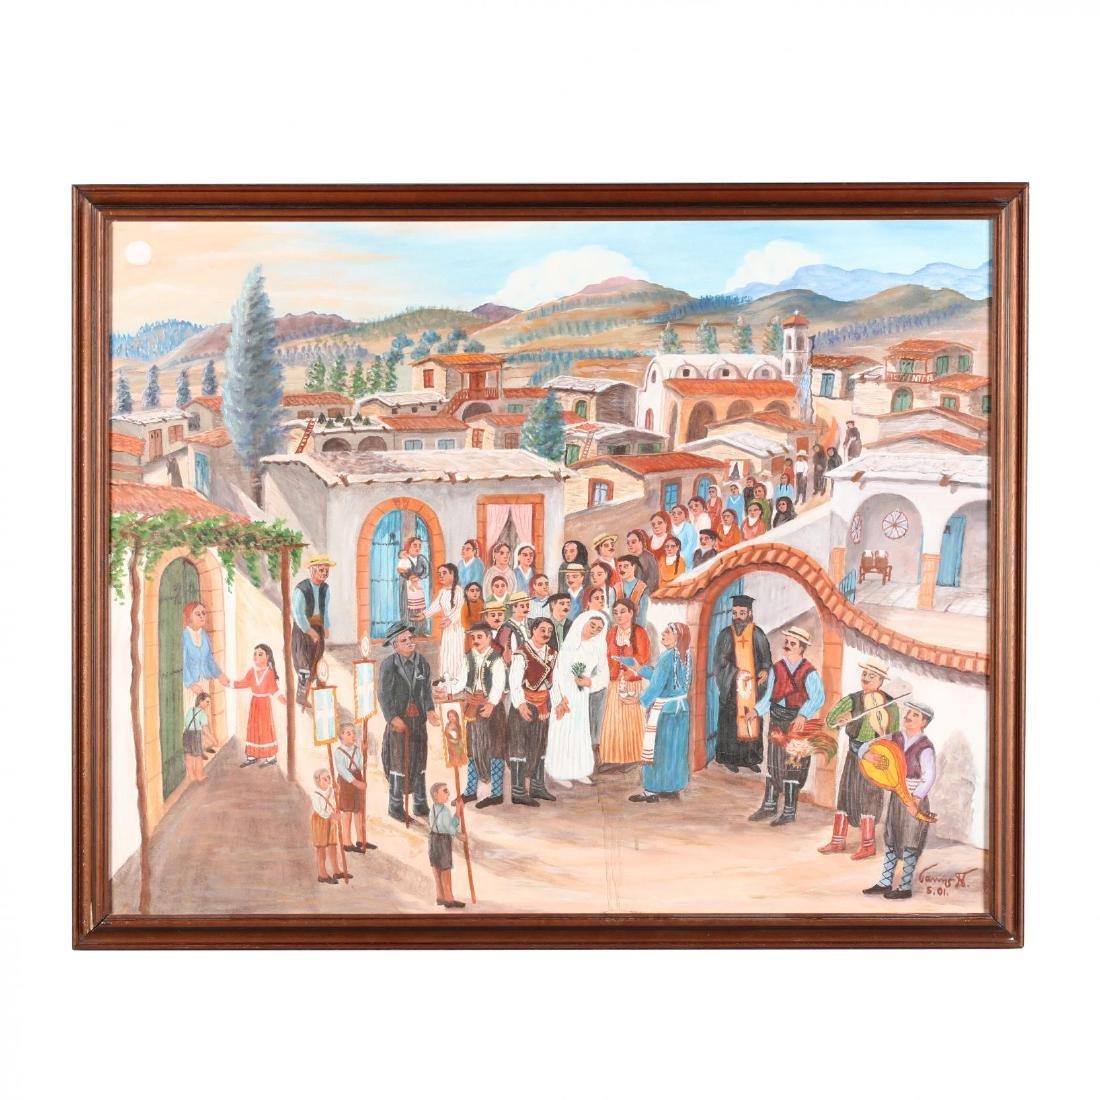 Yiannis Pelekanos (Cypriot, b. 1937), A Musical Village